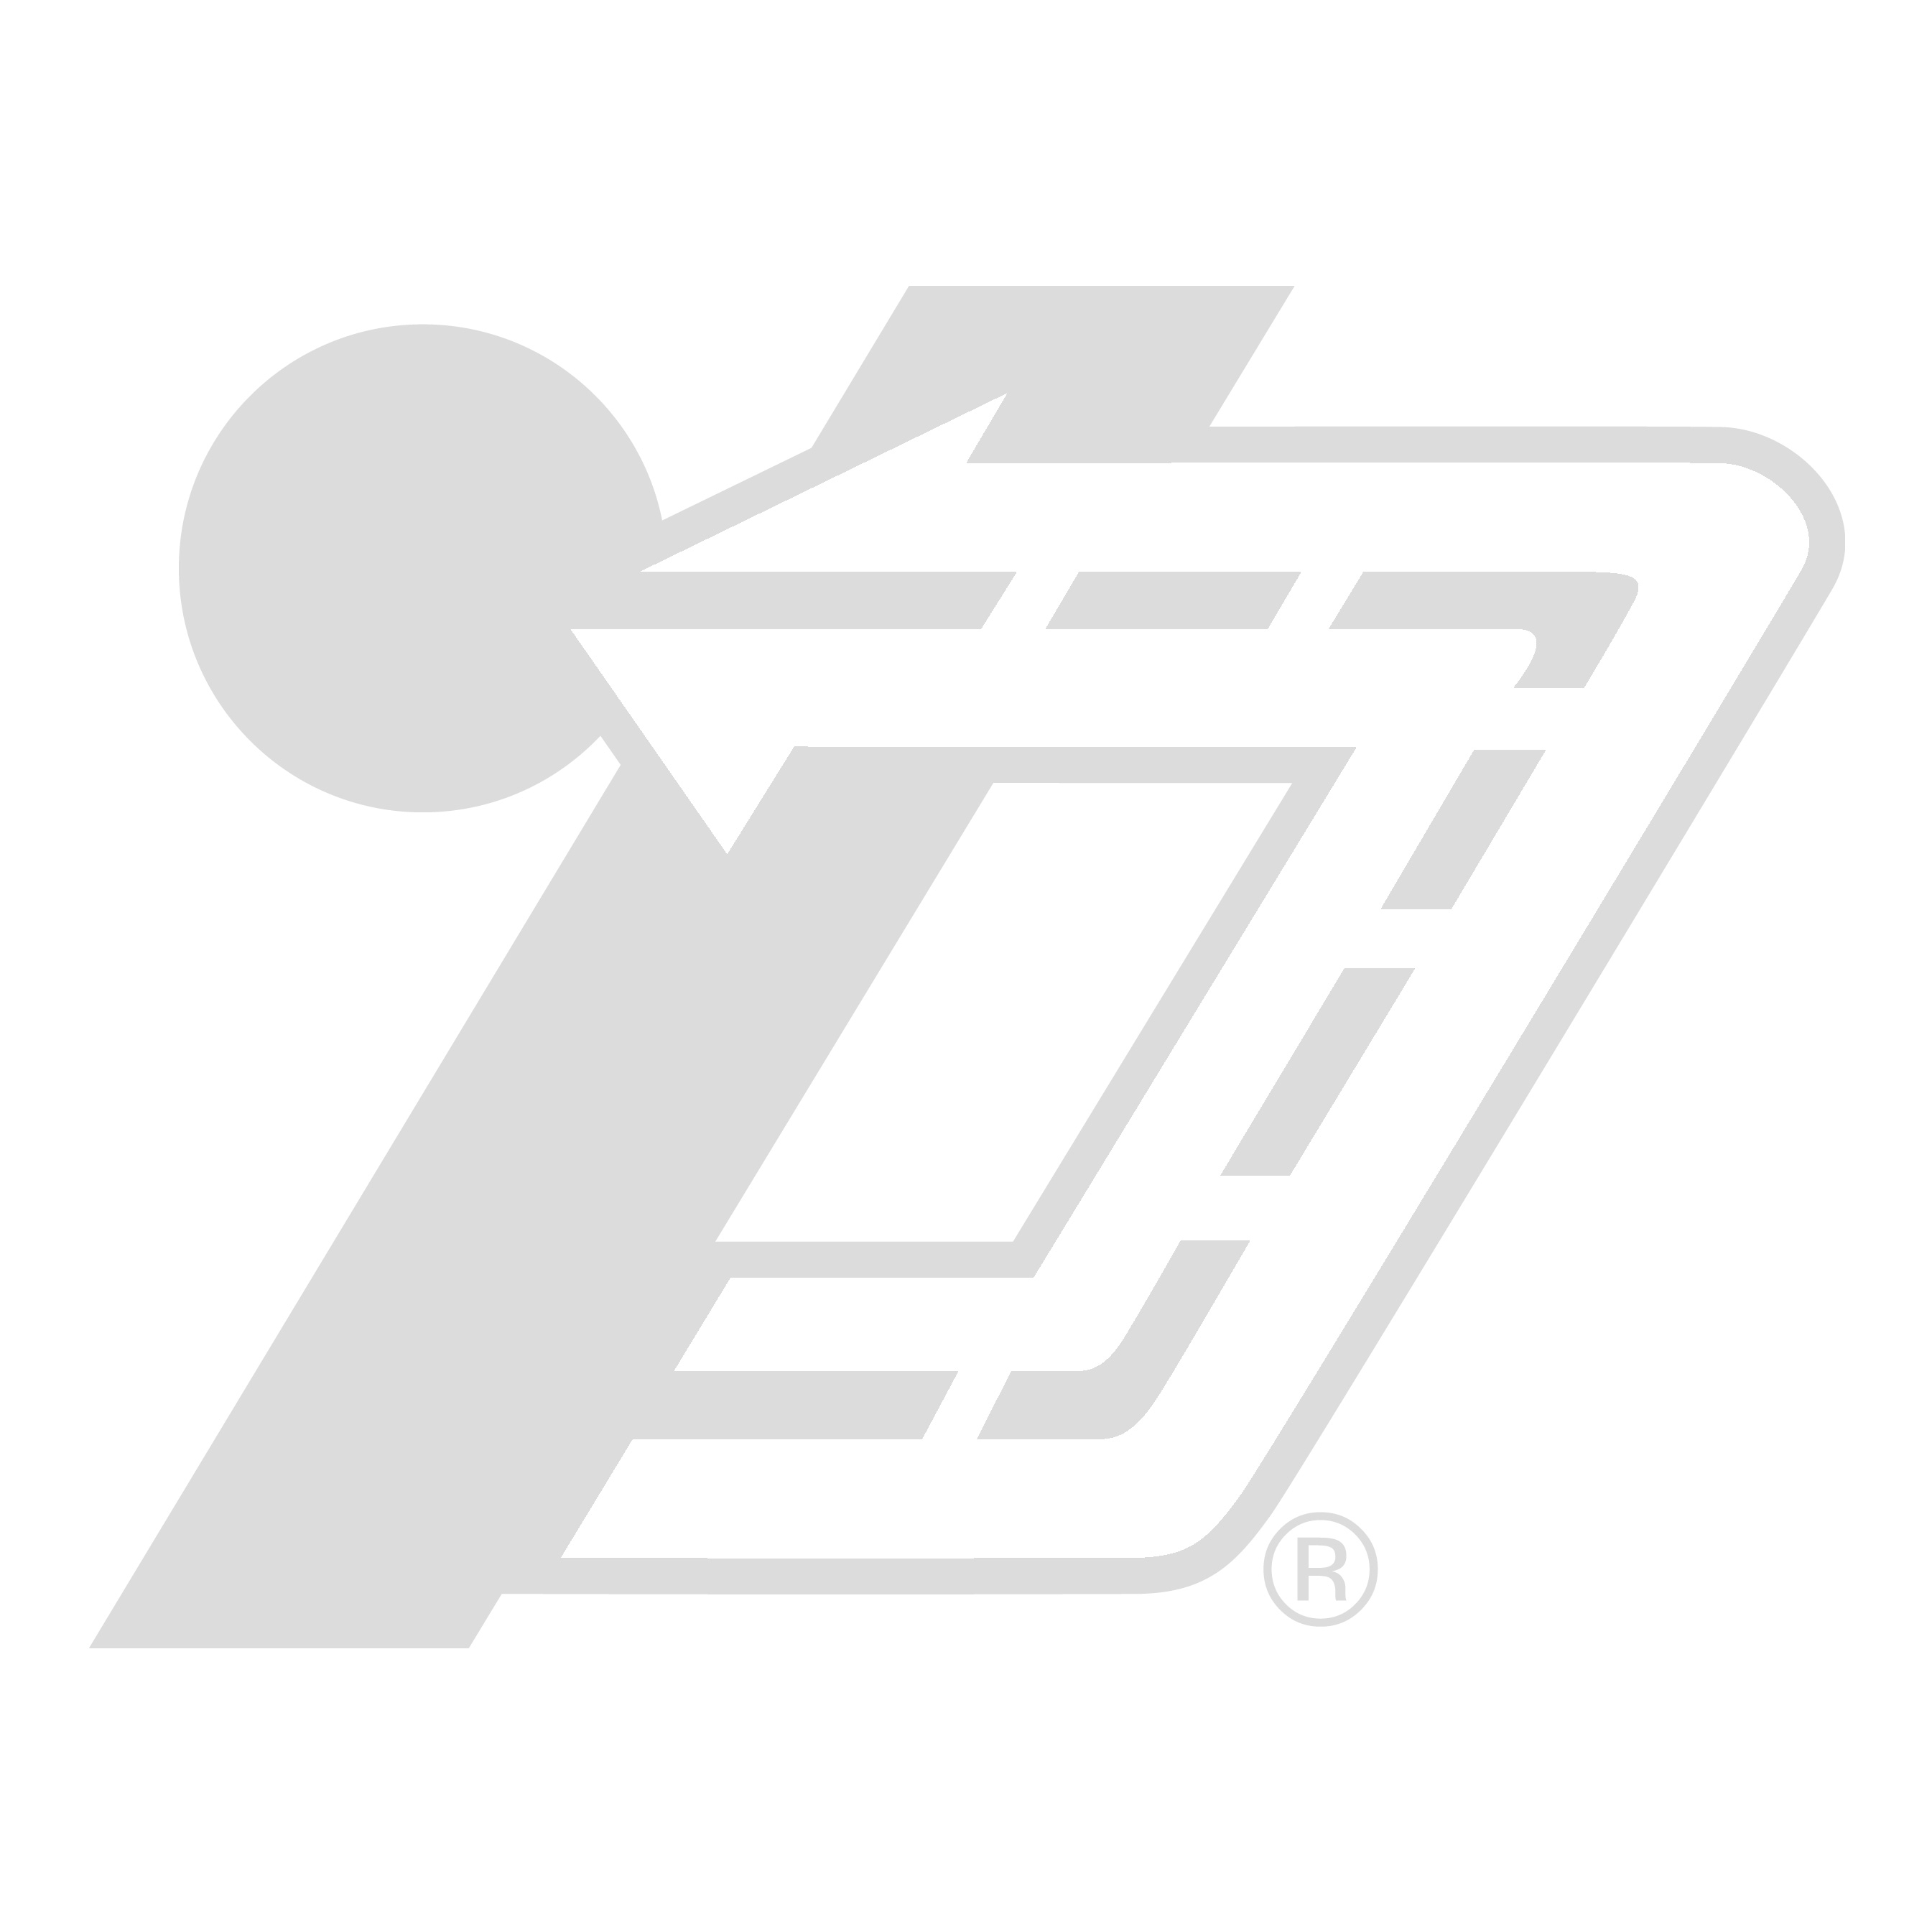 TrafFix Metro-A-Cade Leg - Blue